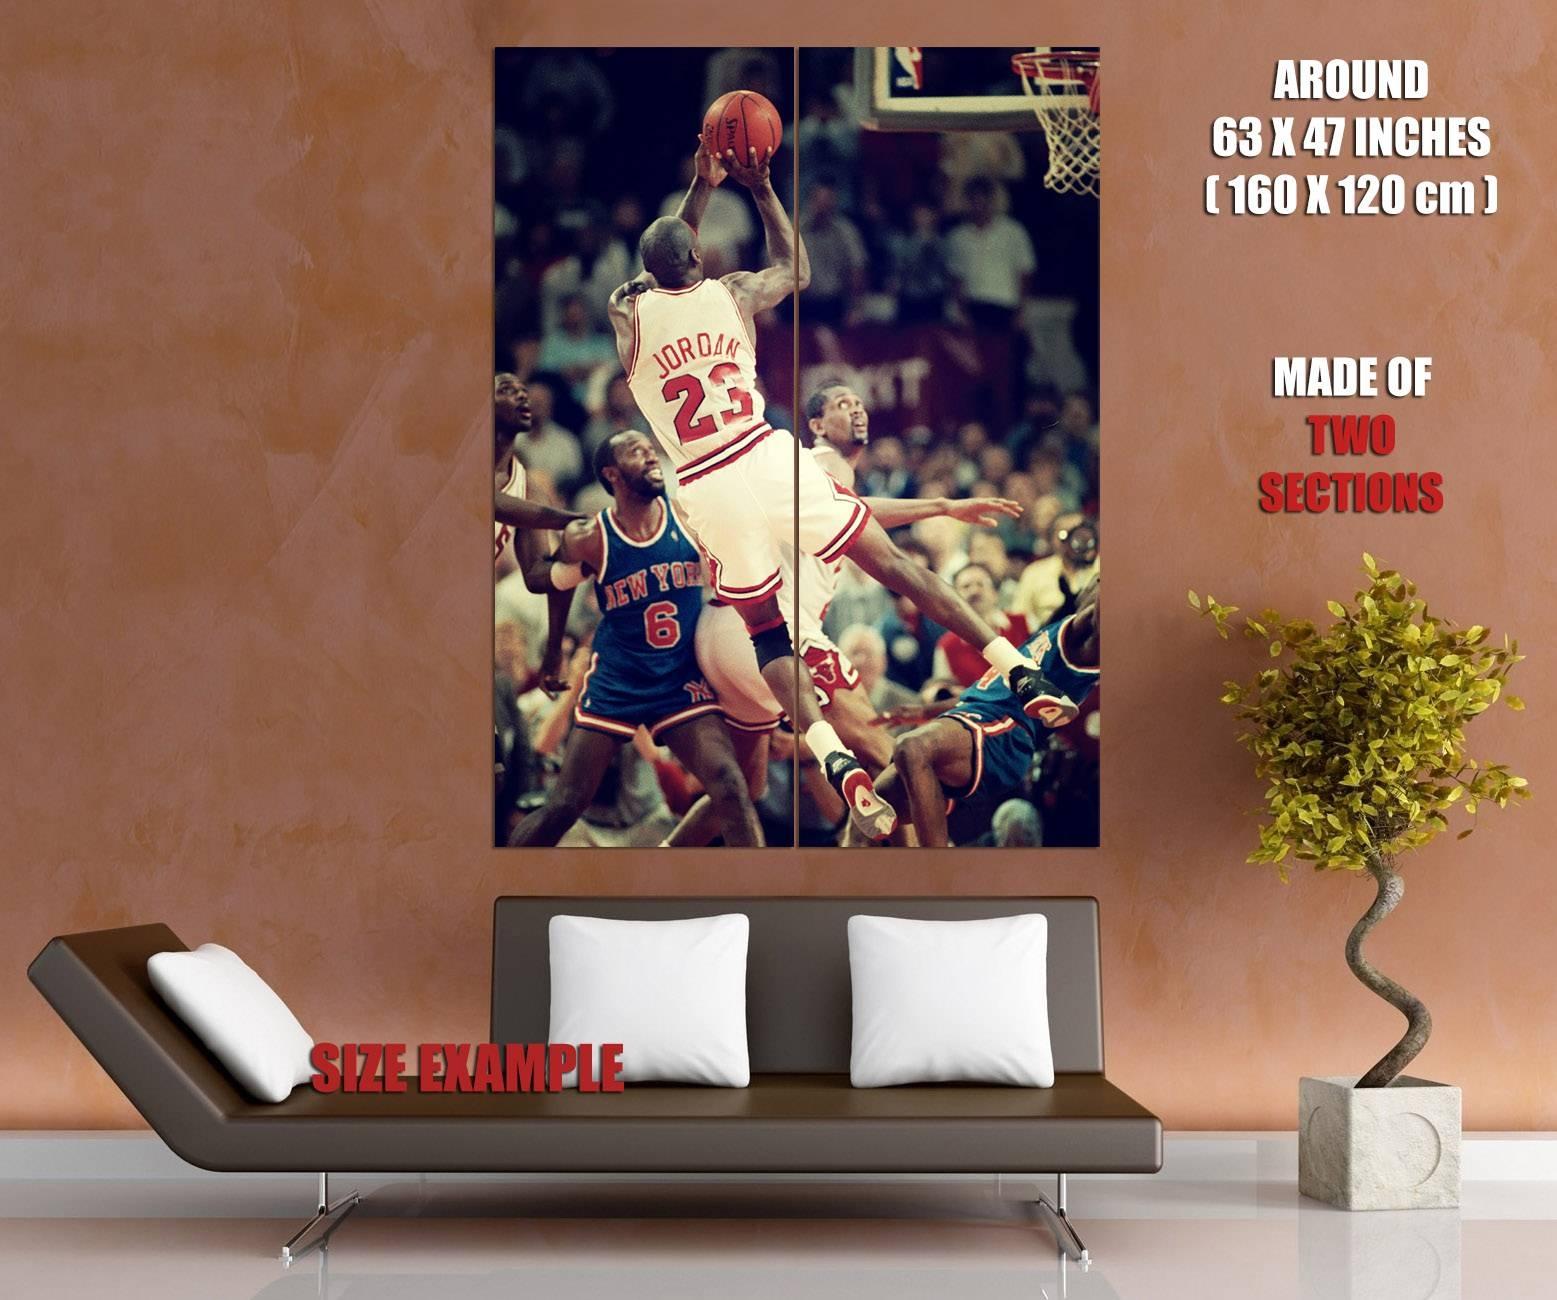 Michael Jordan Fadeaway Shot Nba Wall Print Poster | Ebay For Best And Newest Nba Wall Murals (View 12 of 25)